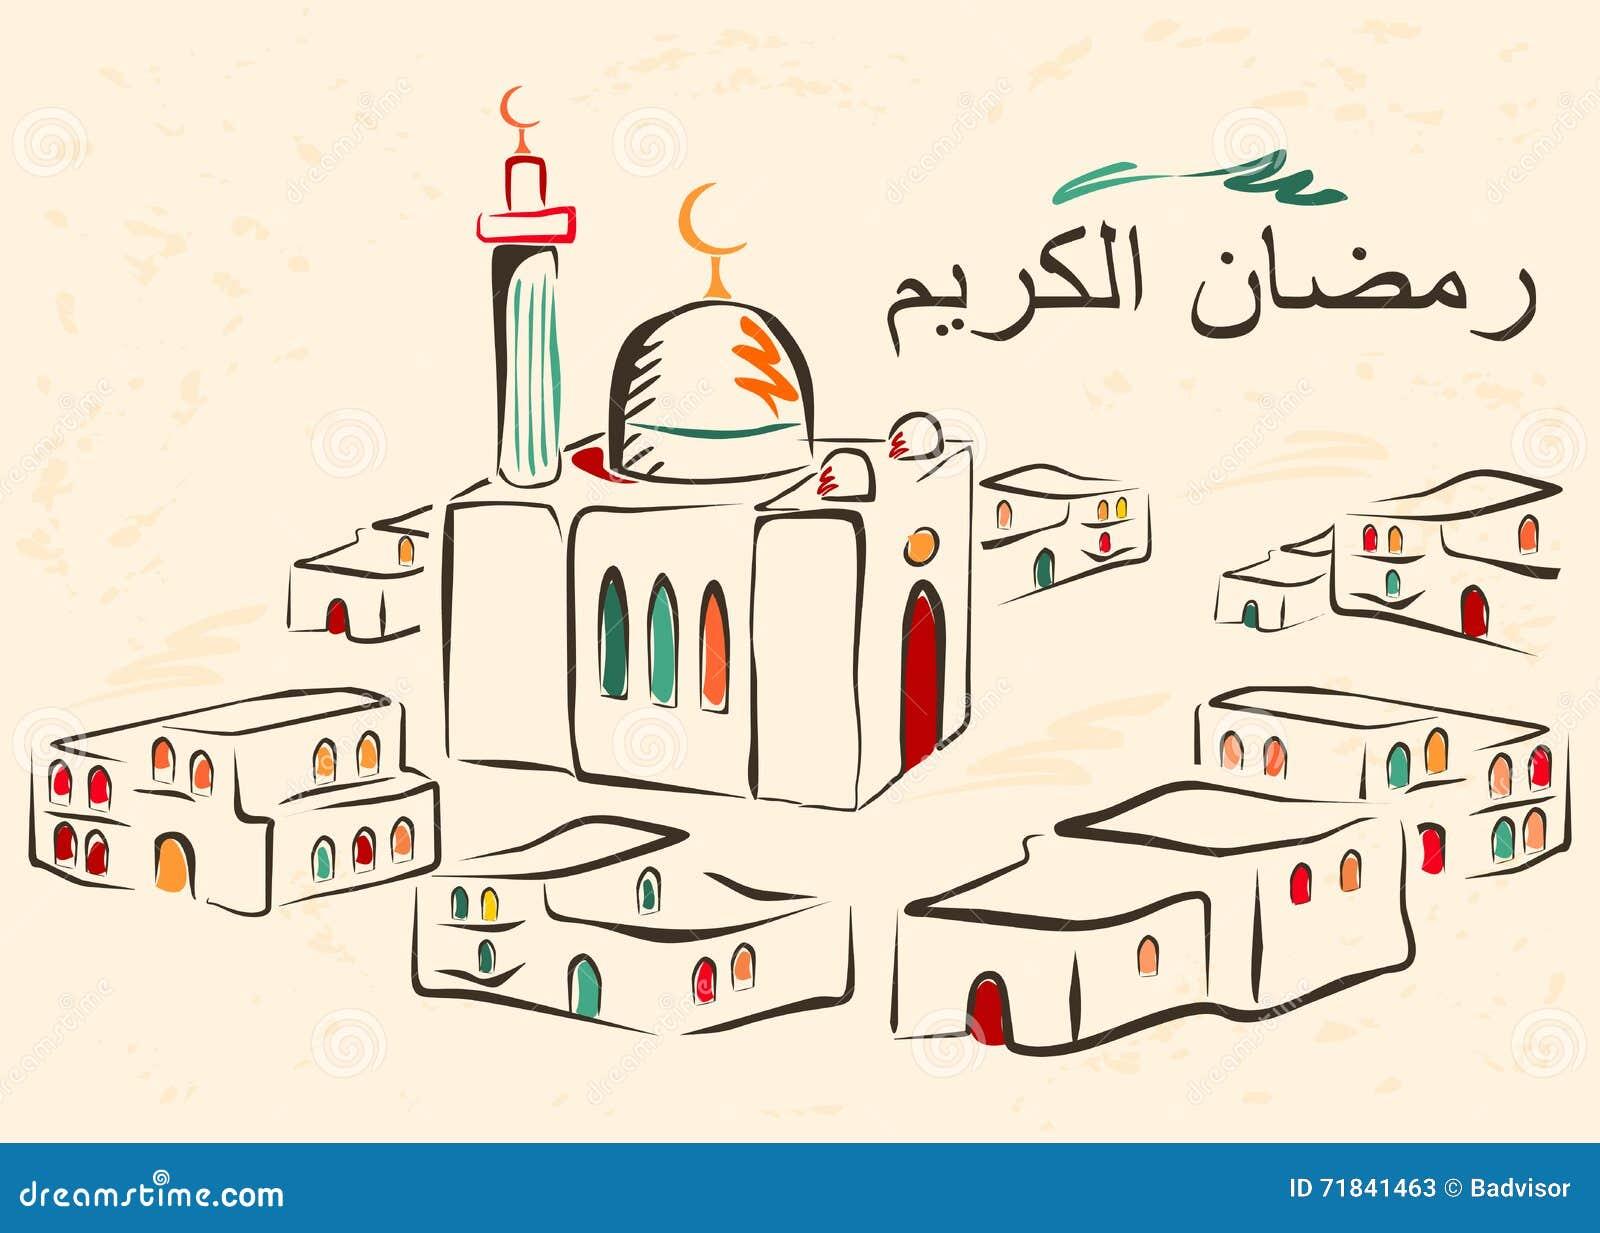 Ramadan greetings in arabic script stock vector illustration of ramadan greetings in arabic script m4hsunfo